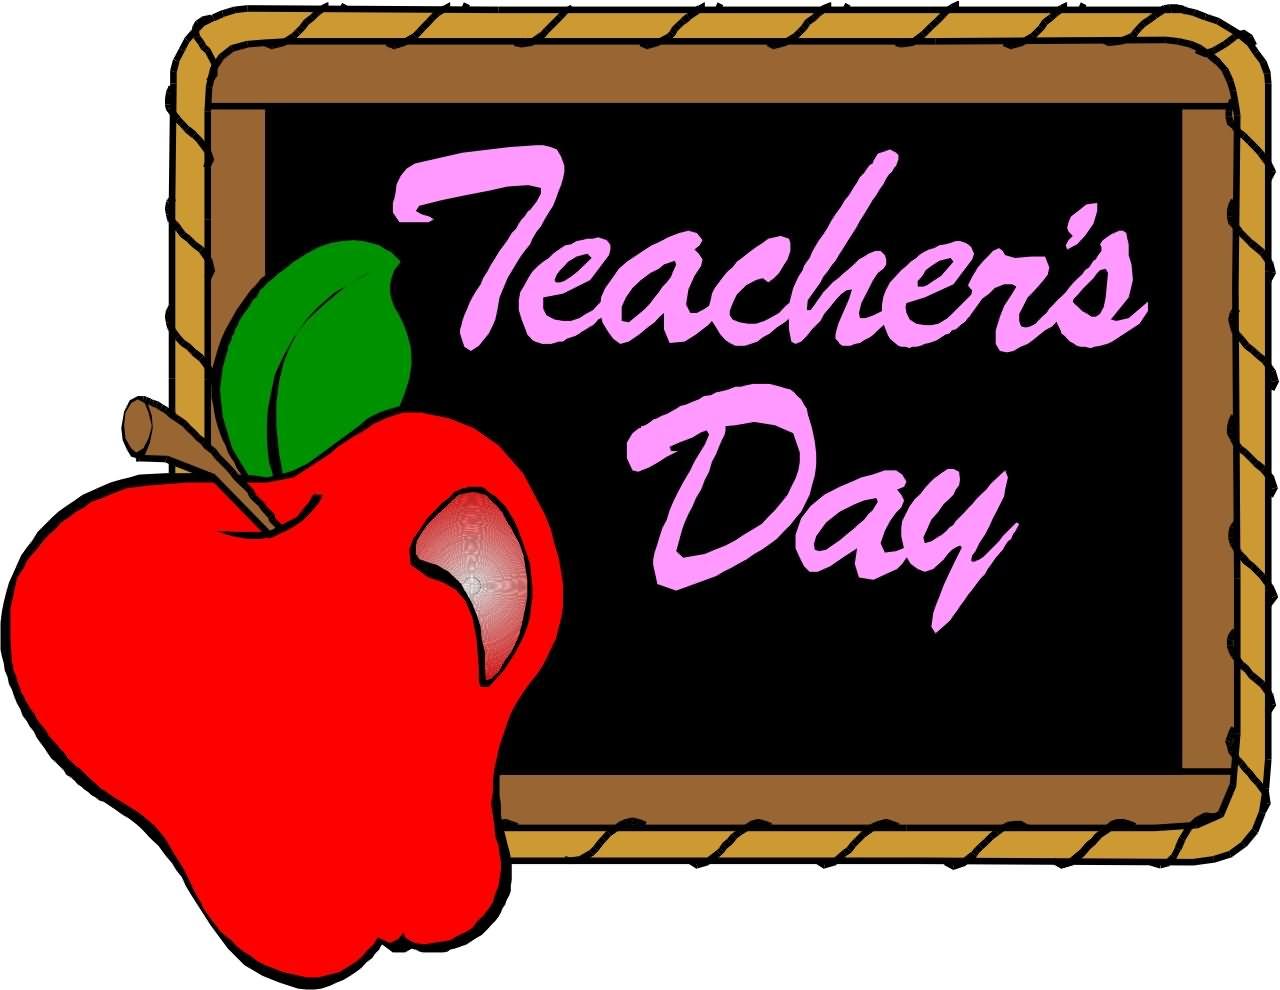 clipart for teachers day - photo #2